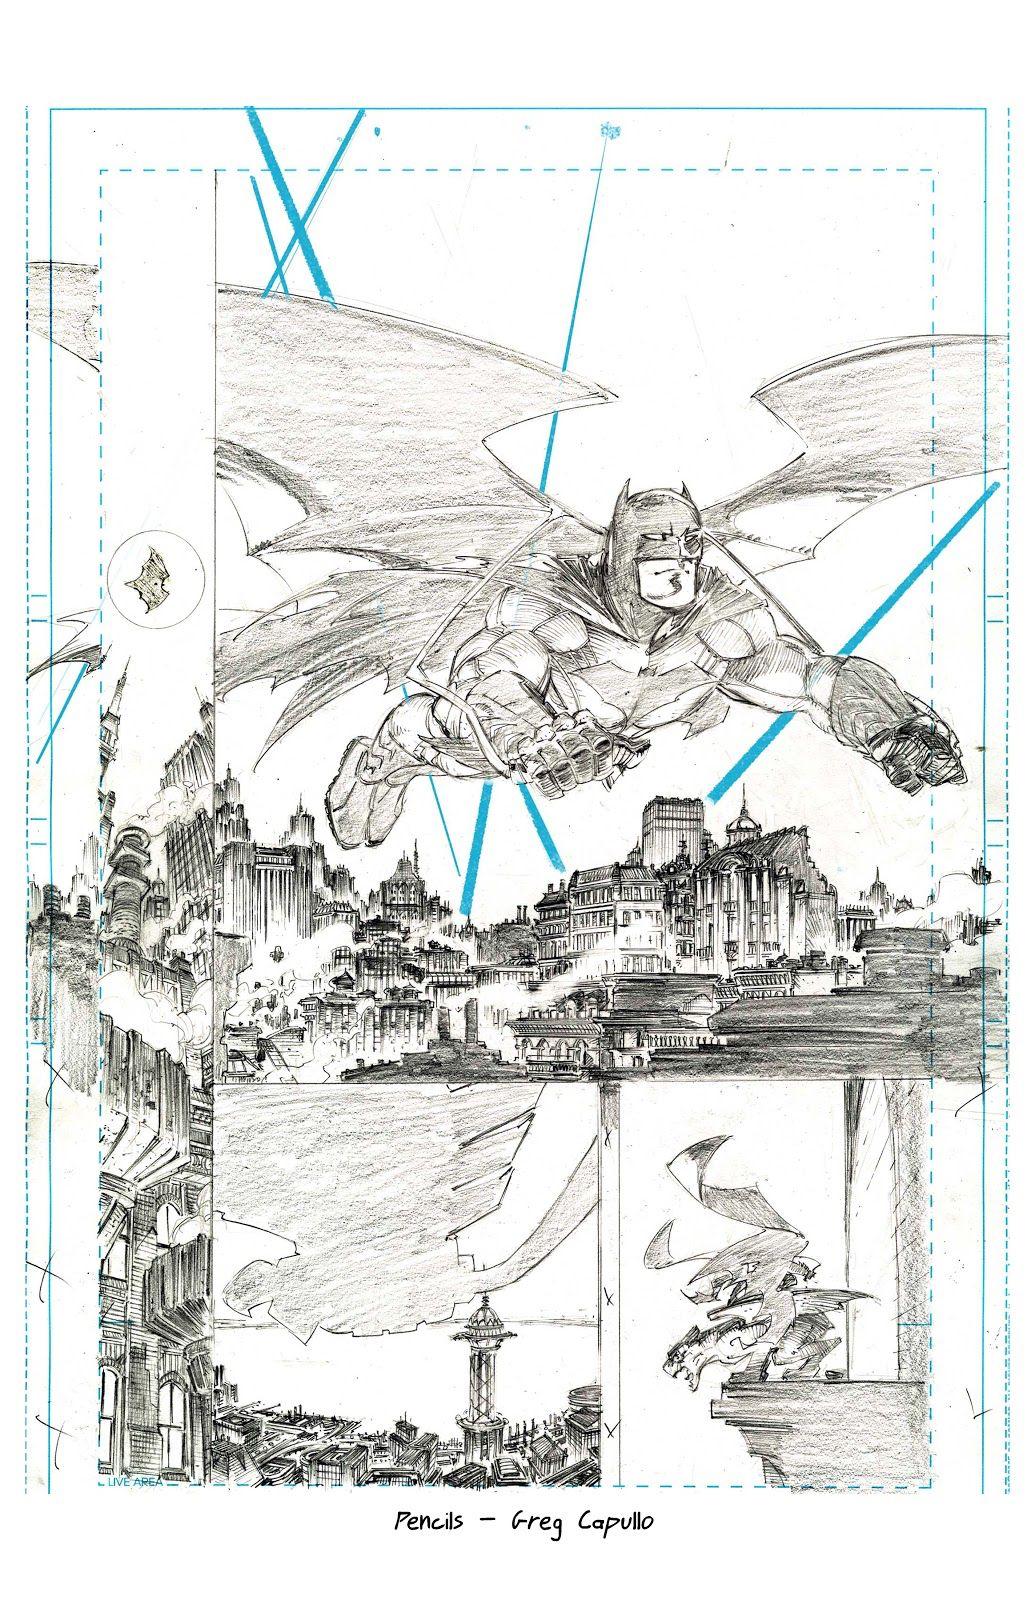 Image from http://2.bp.blogspot.com/-vH5pb7uJ2Xk/UOTNiRqXw5I/AAAAAAAAAUQ/5yUop4CBpgg/s1600/Greg_Capullo_Batman1_Pencils.jpg.